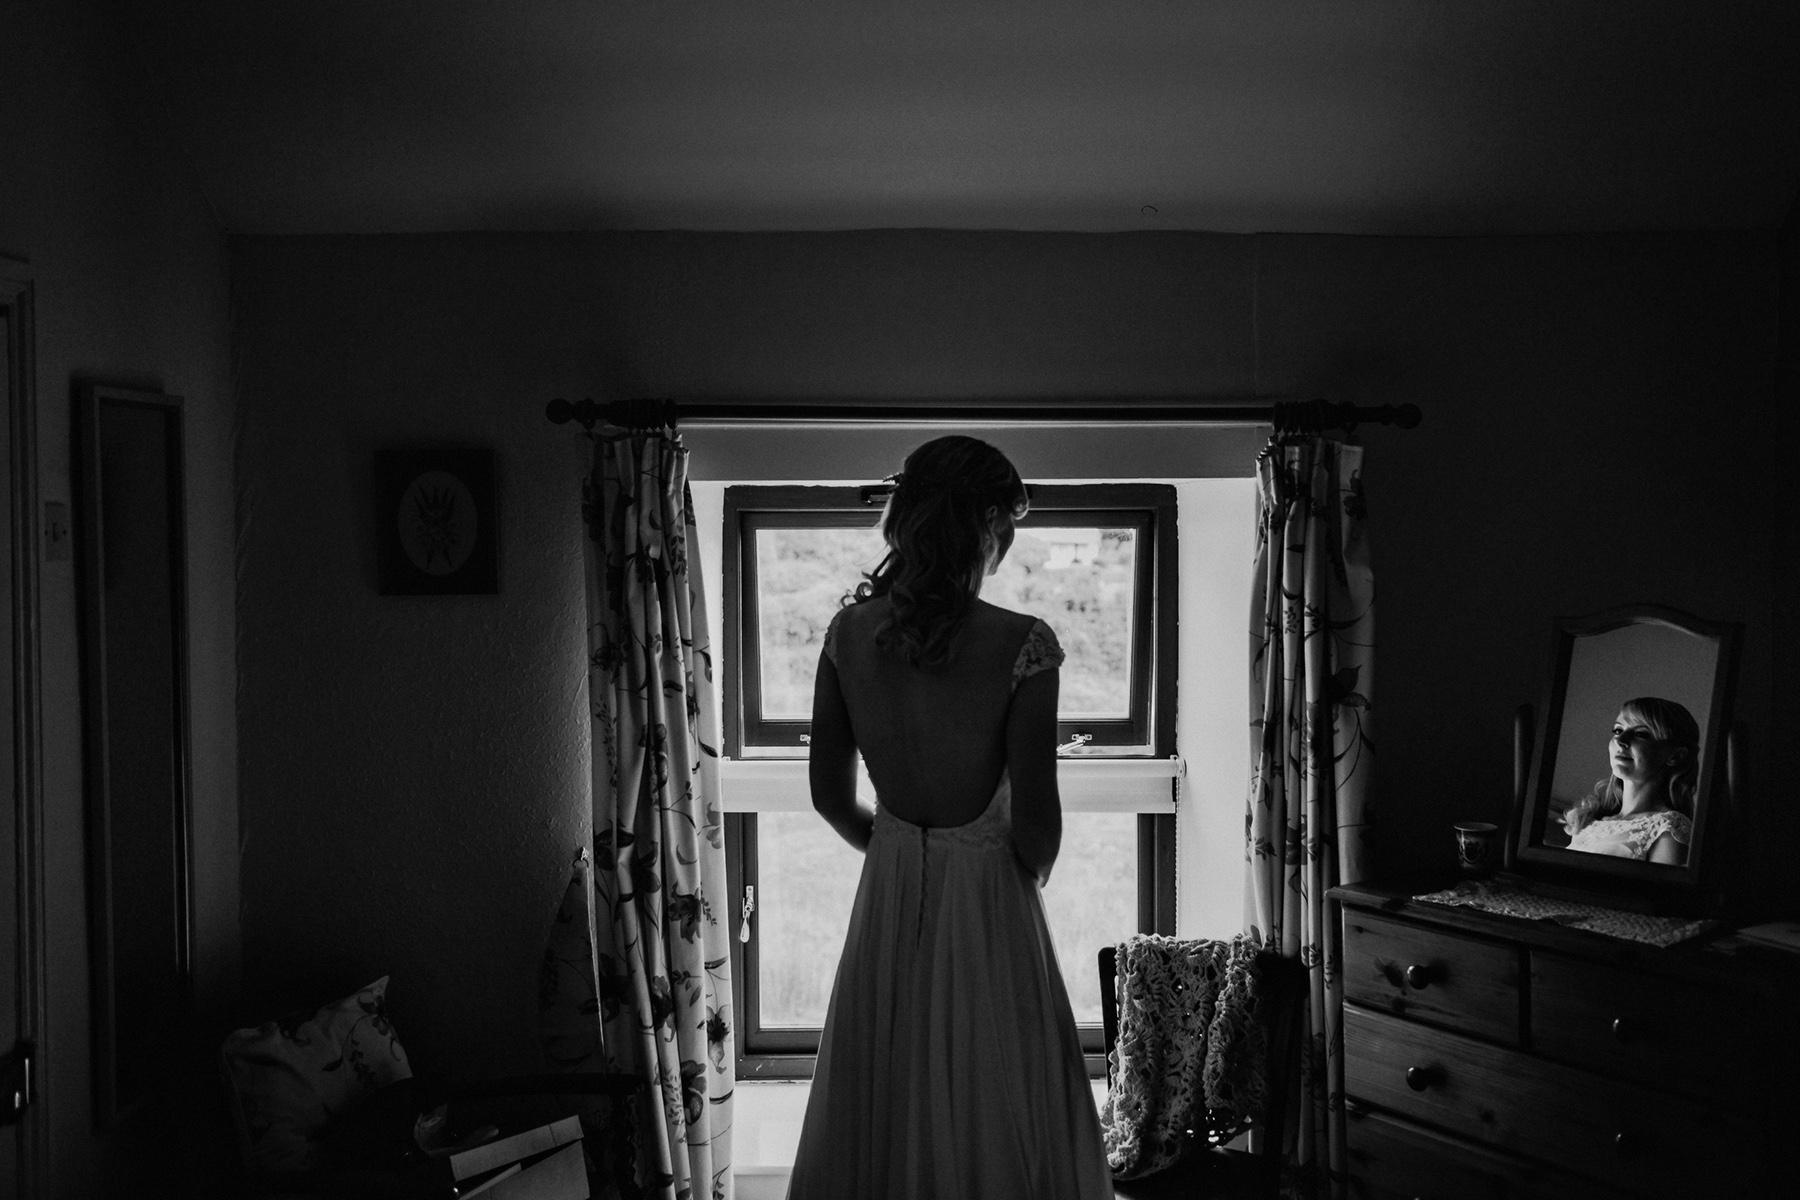 Snowdonia-Wales-Wedding-Photos-0302.jpg